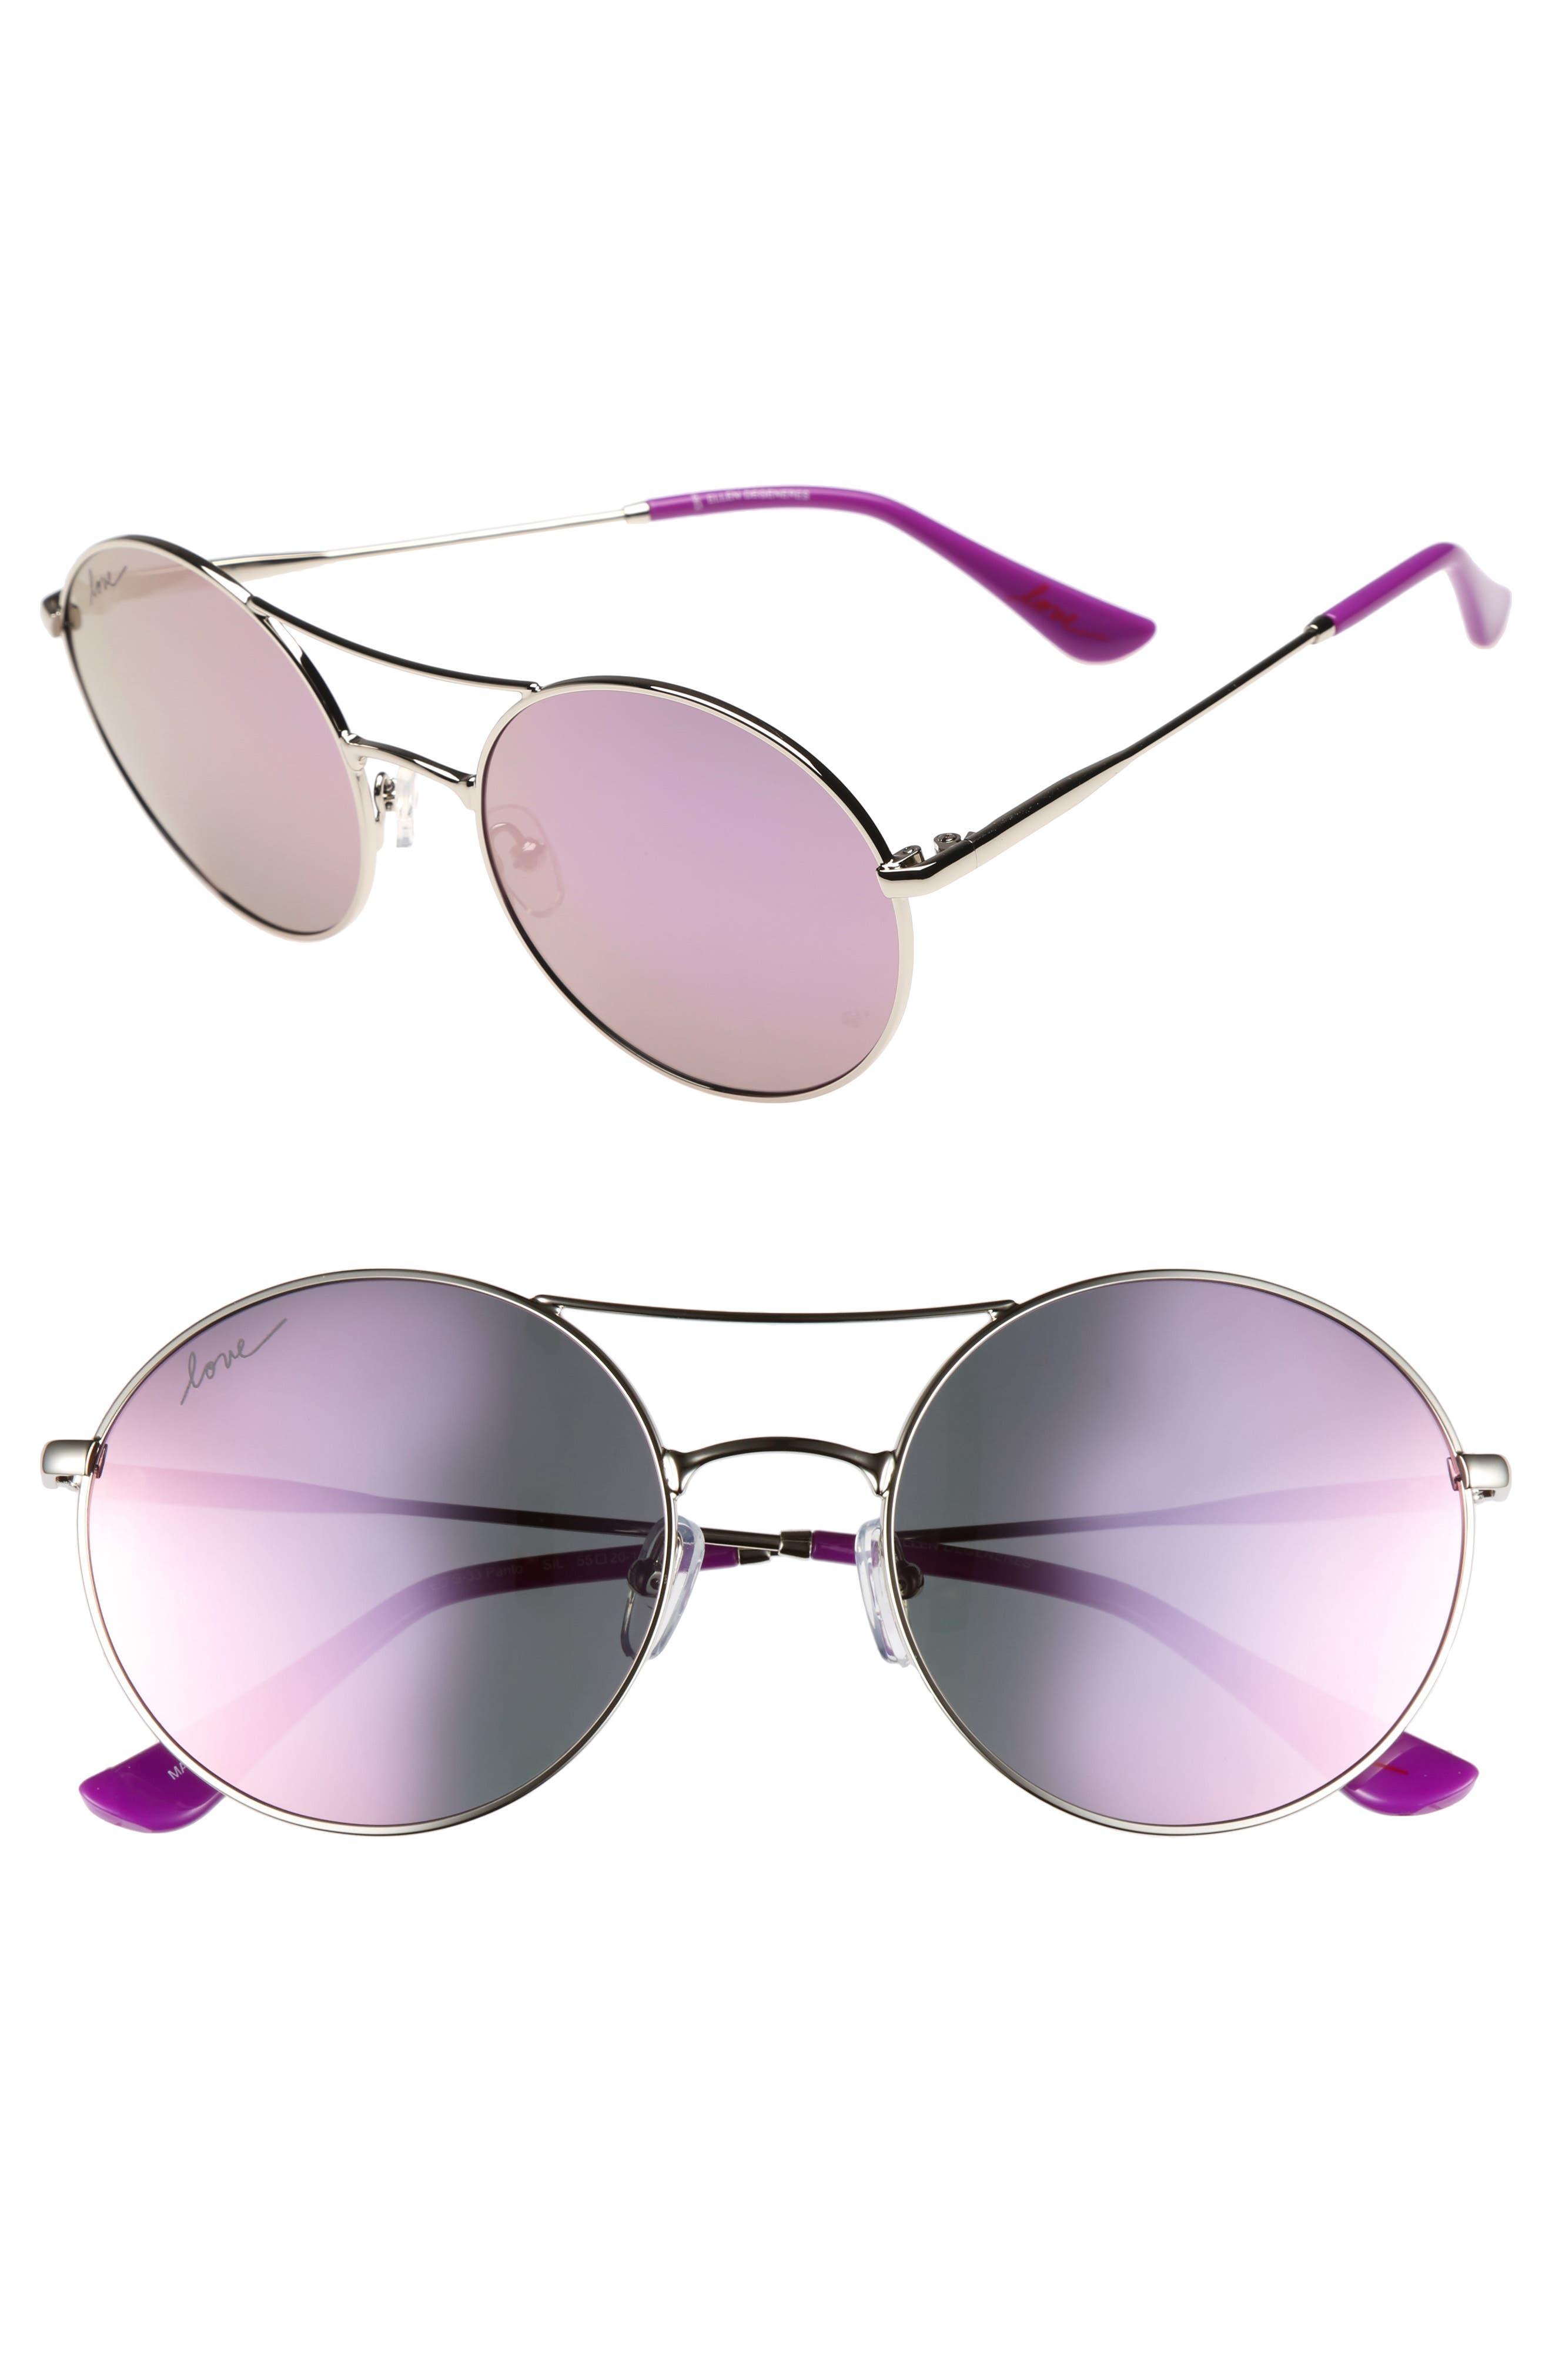 55mm Round Sunglasses,                         Main,                         color, SILVER